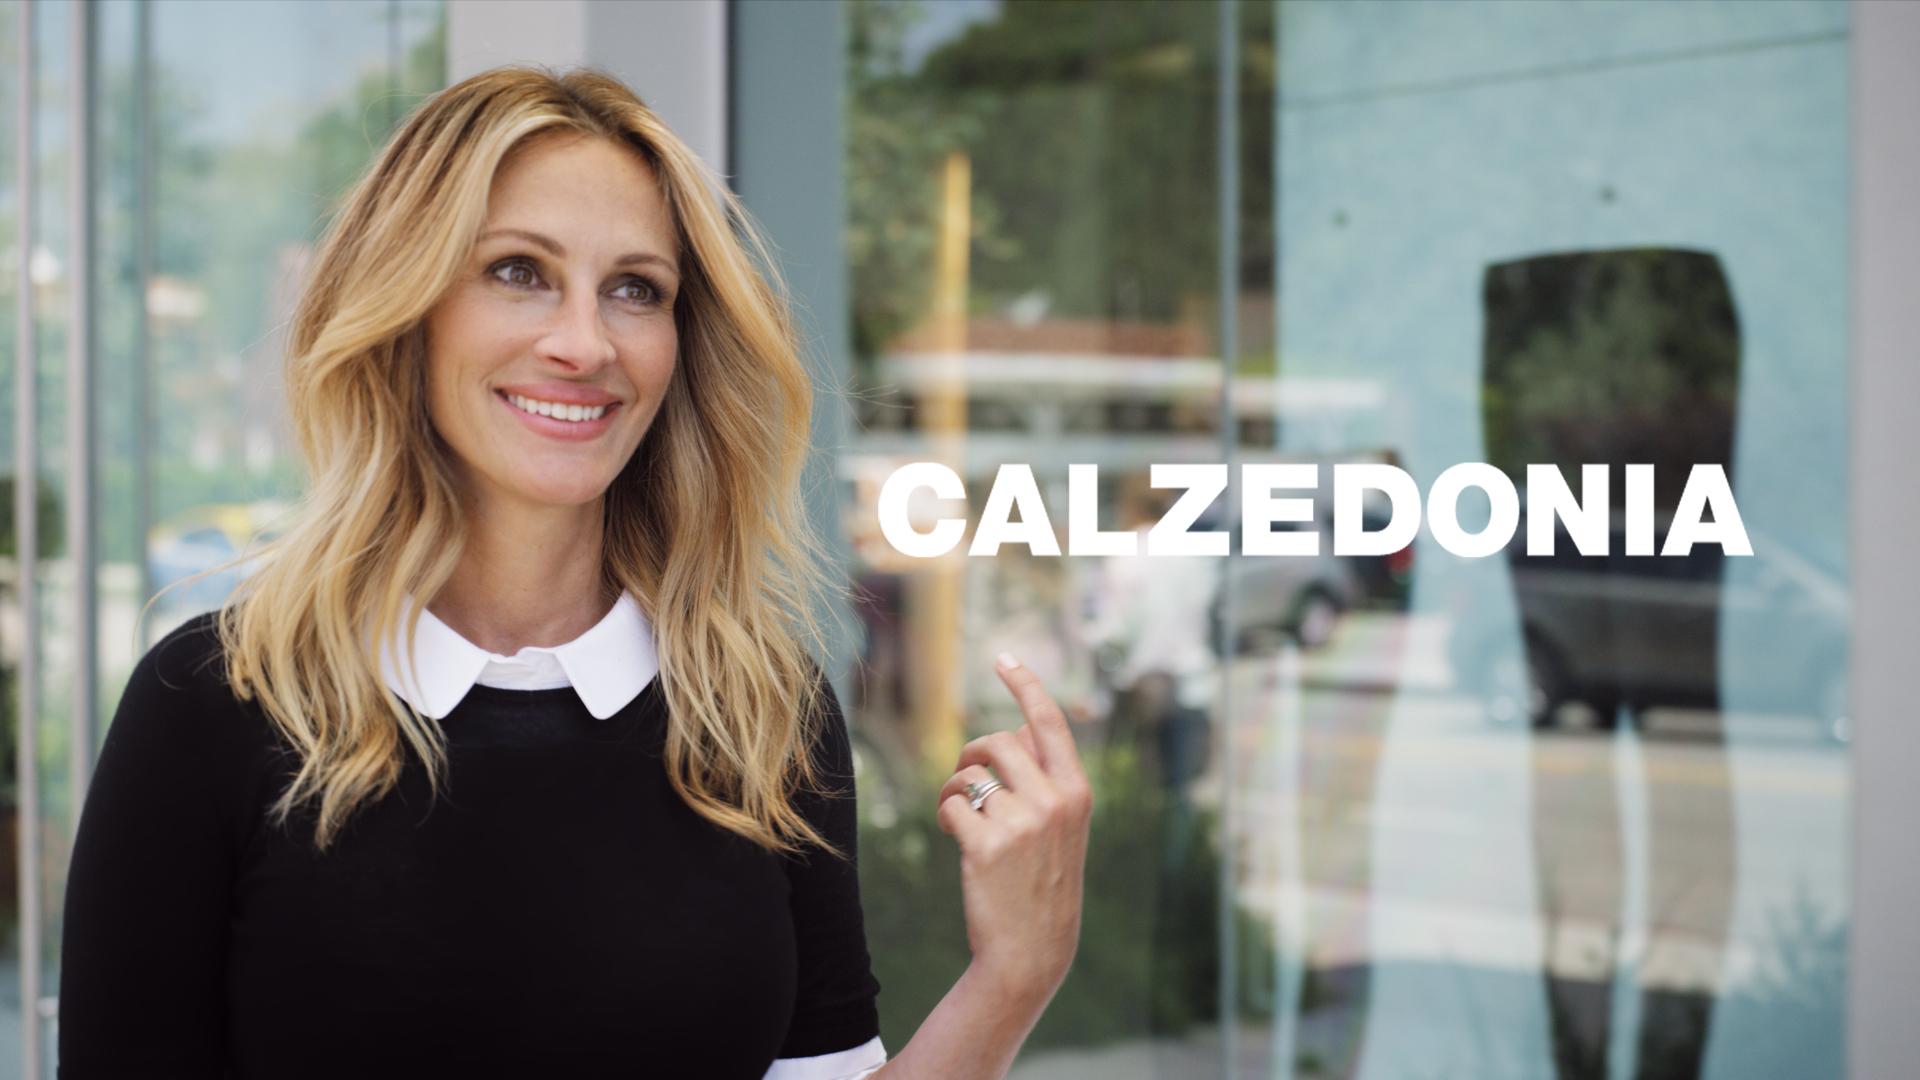 Julia Roberts in Calzedonia 2015 TV Advertising Campaign